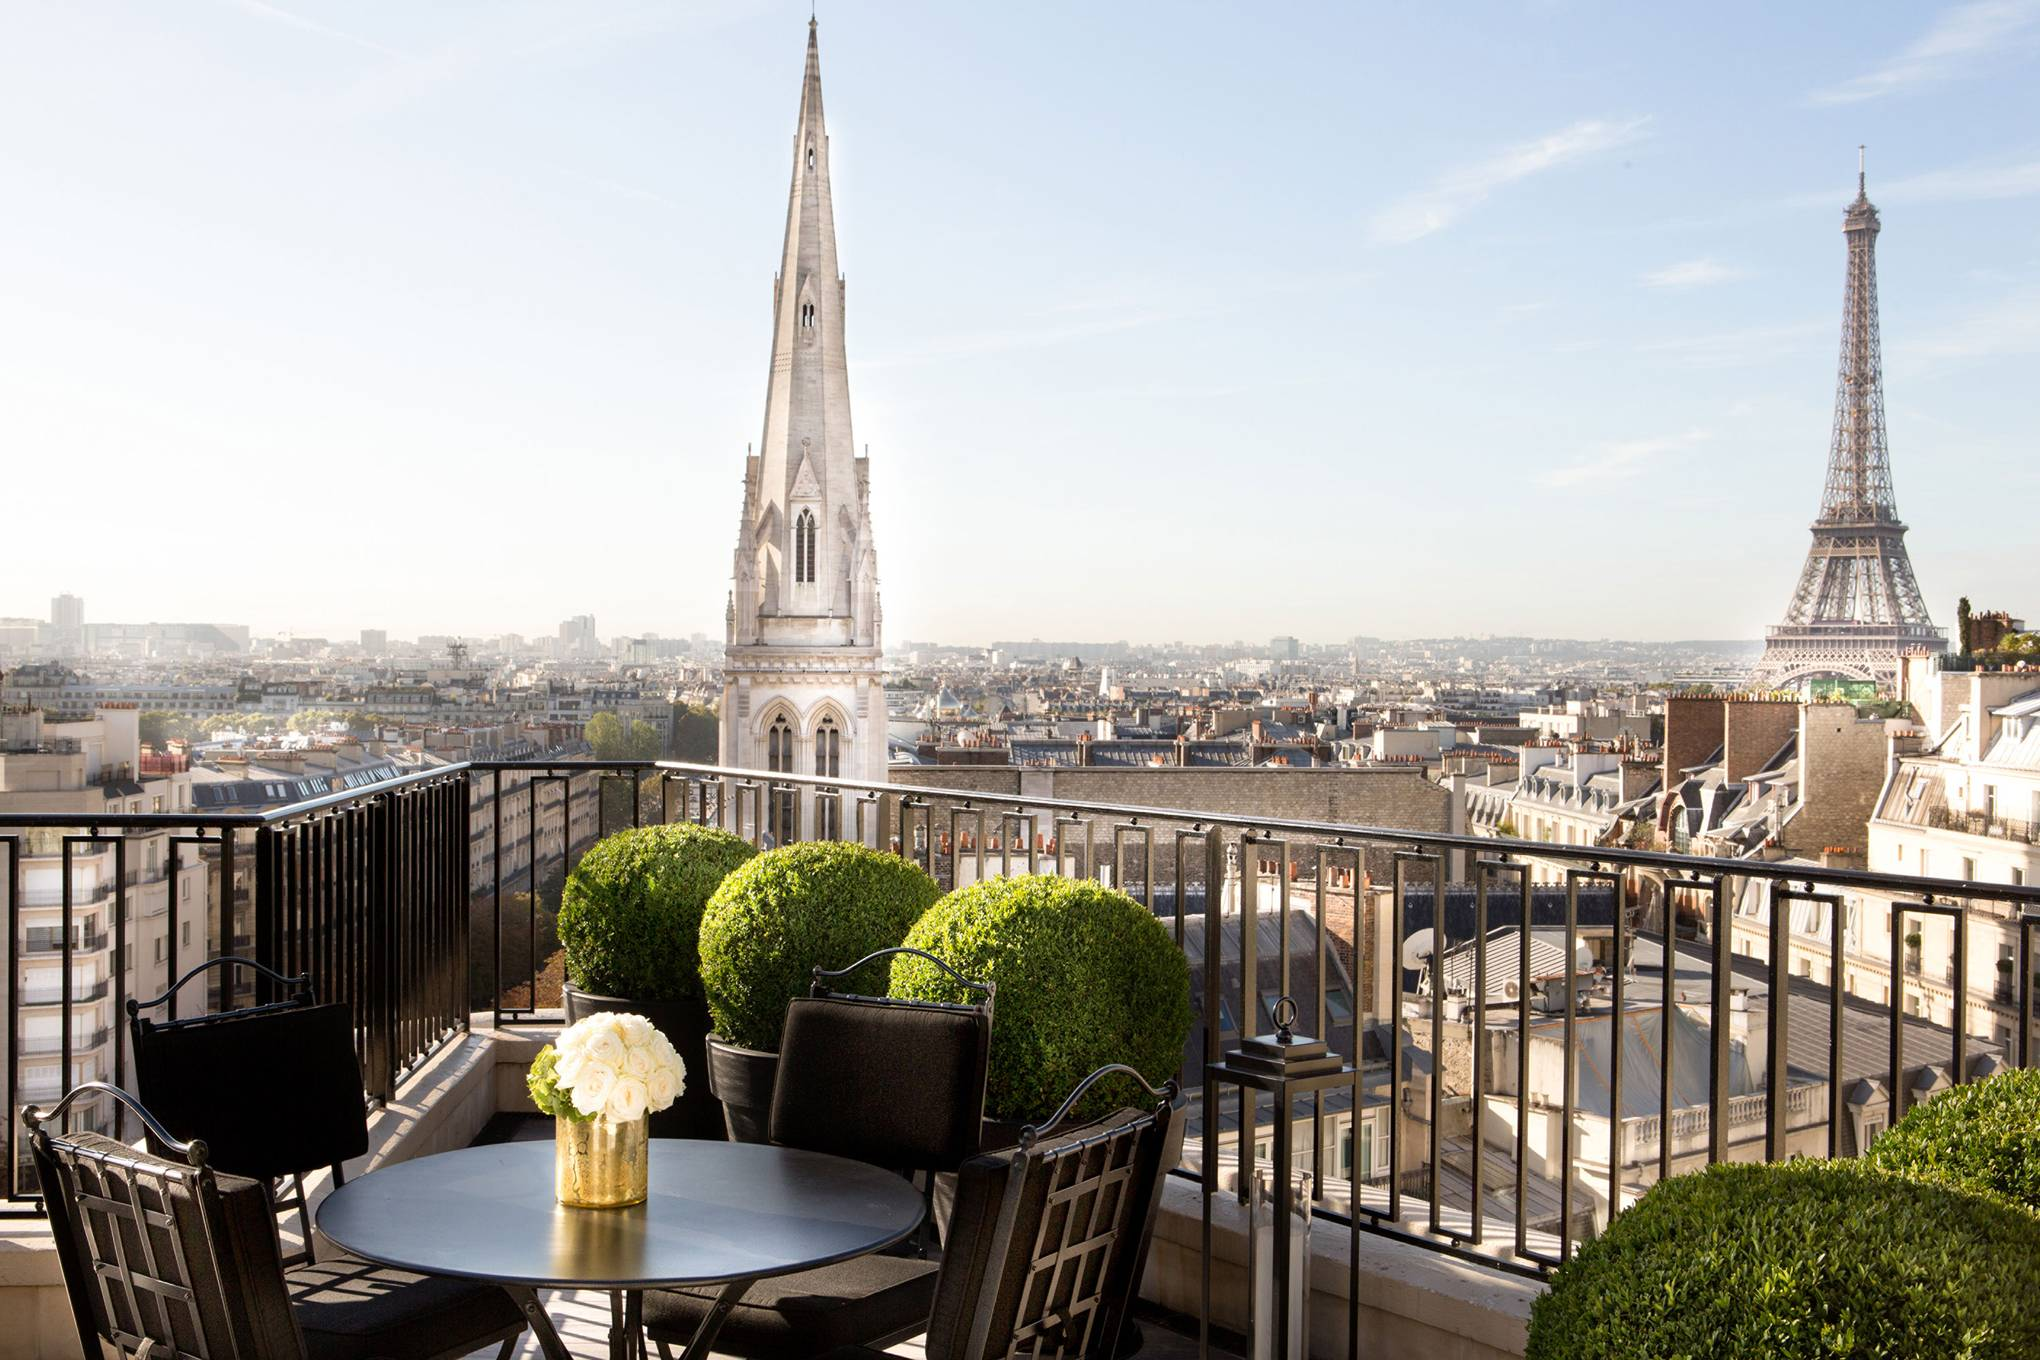 Four-Seasons-Hotel-George-V-Paris-conde-nast-traveller-15jan18-pr